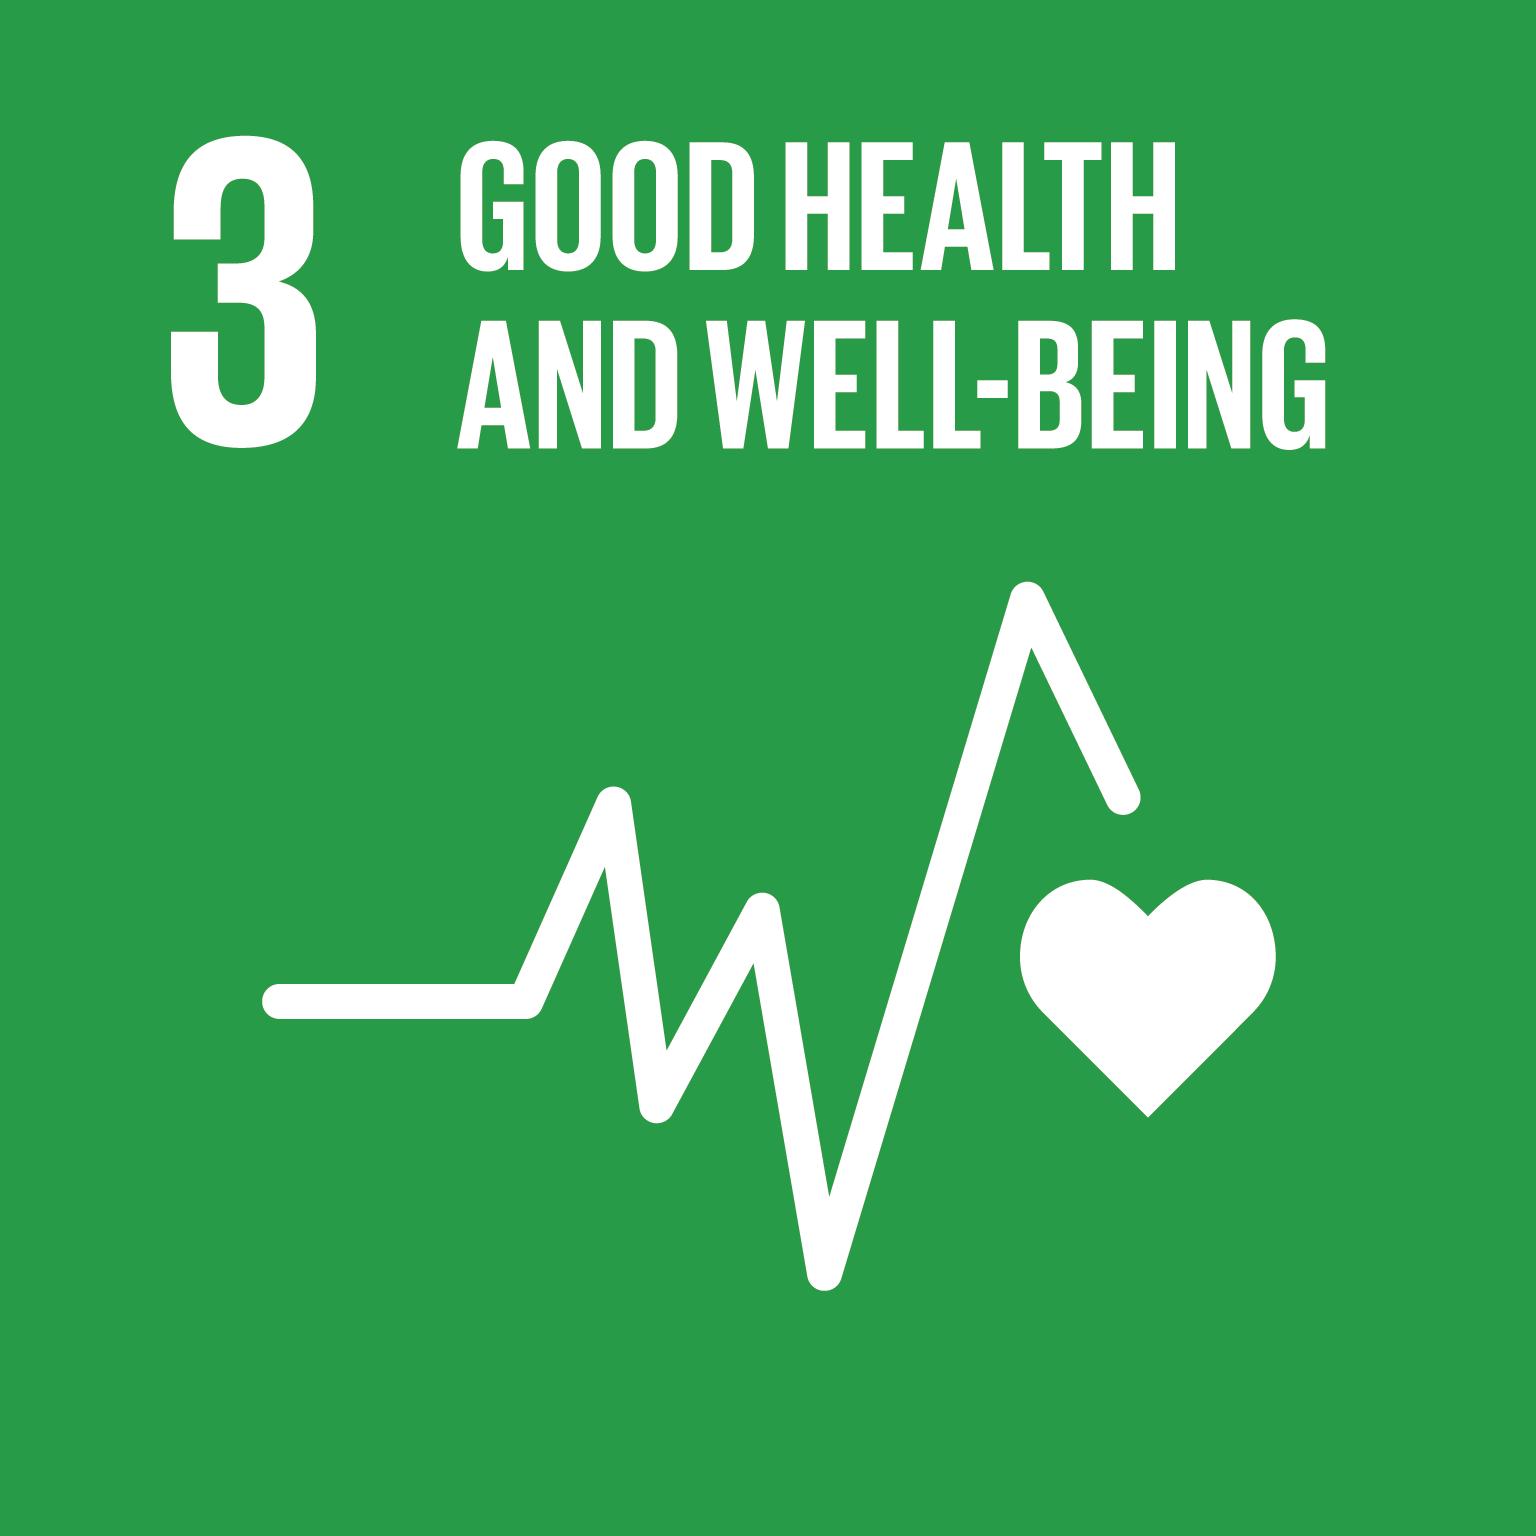 E_SDG-goals_Goal-03.png